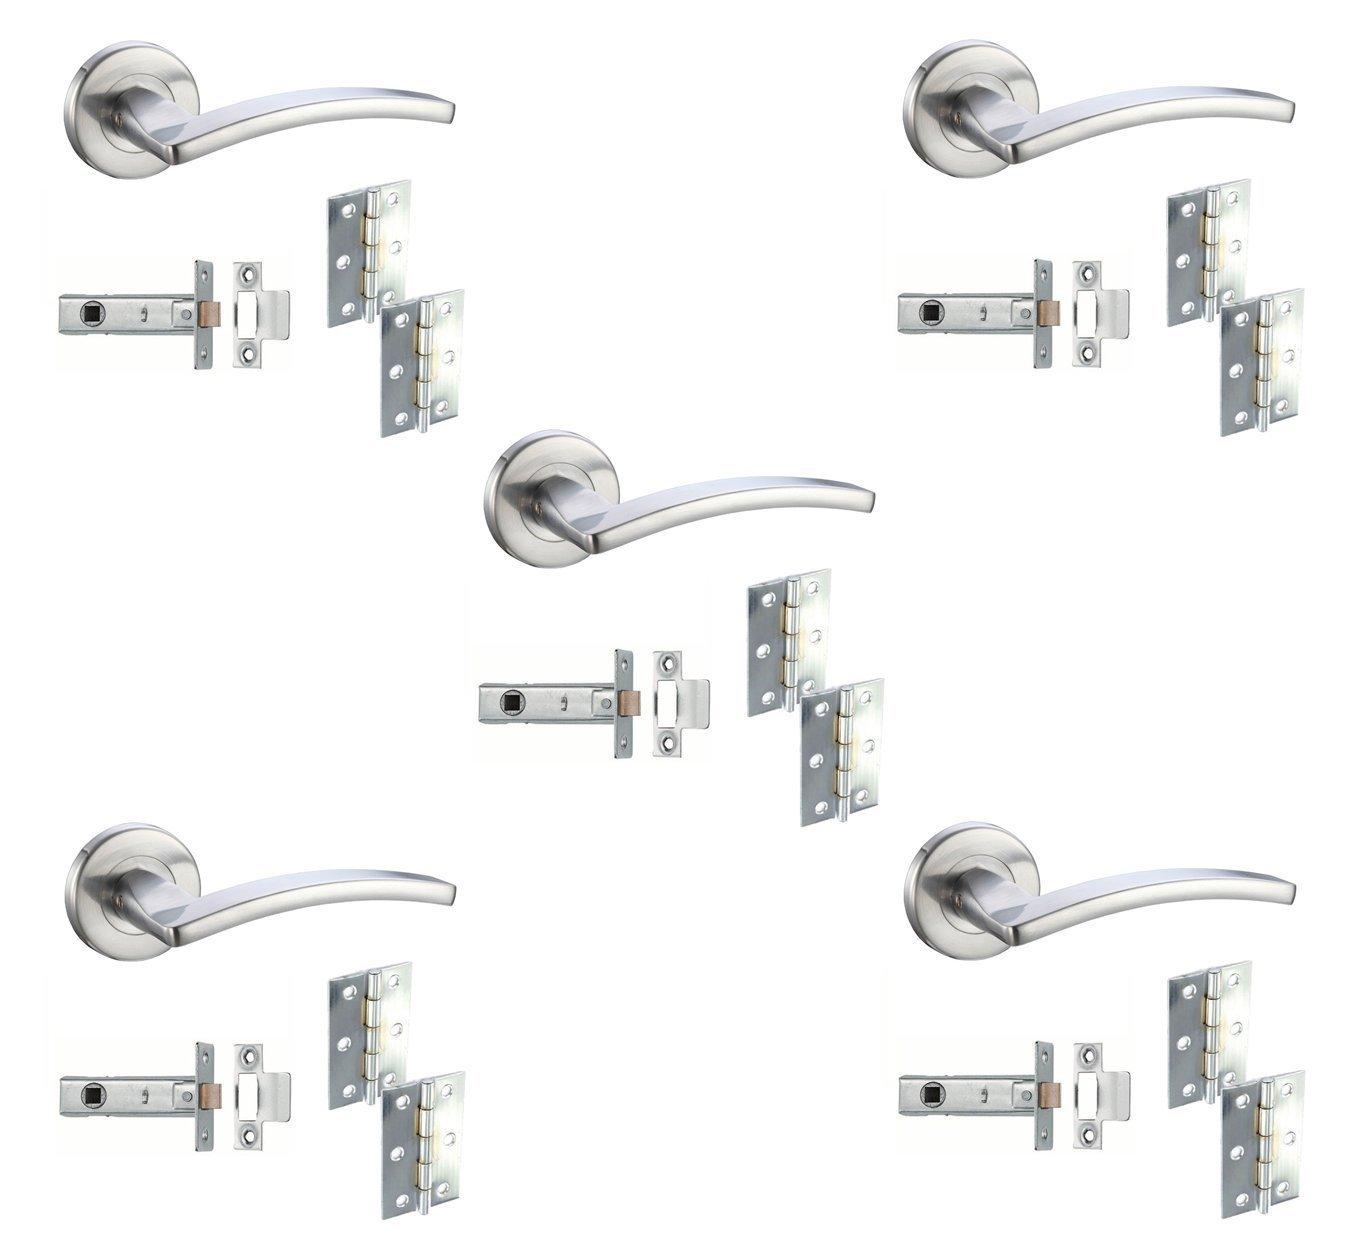 Toledo Lever Internal Door Handle Furniture Packs on Rose Satin Chrome - Bathroom Pack DJM Direct